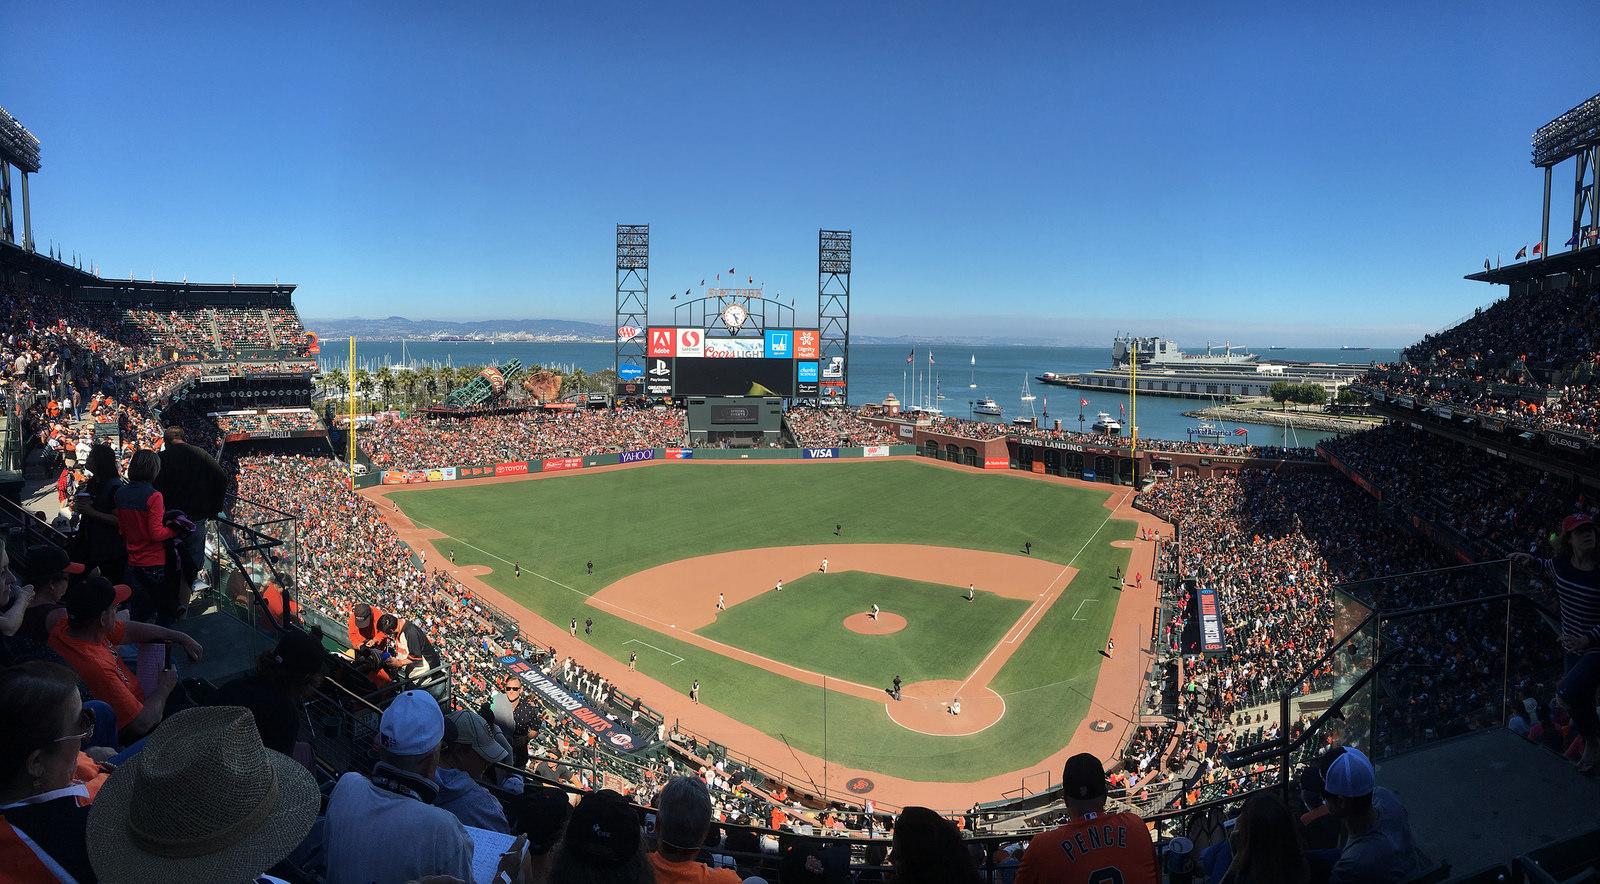 Credit: ballparksofbaseball.com